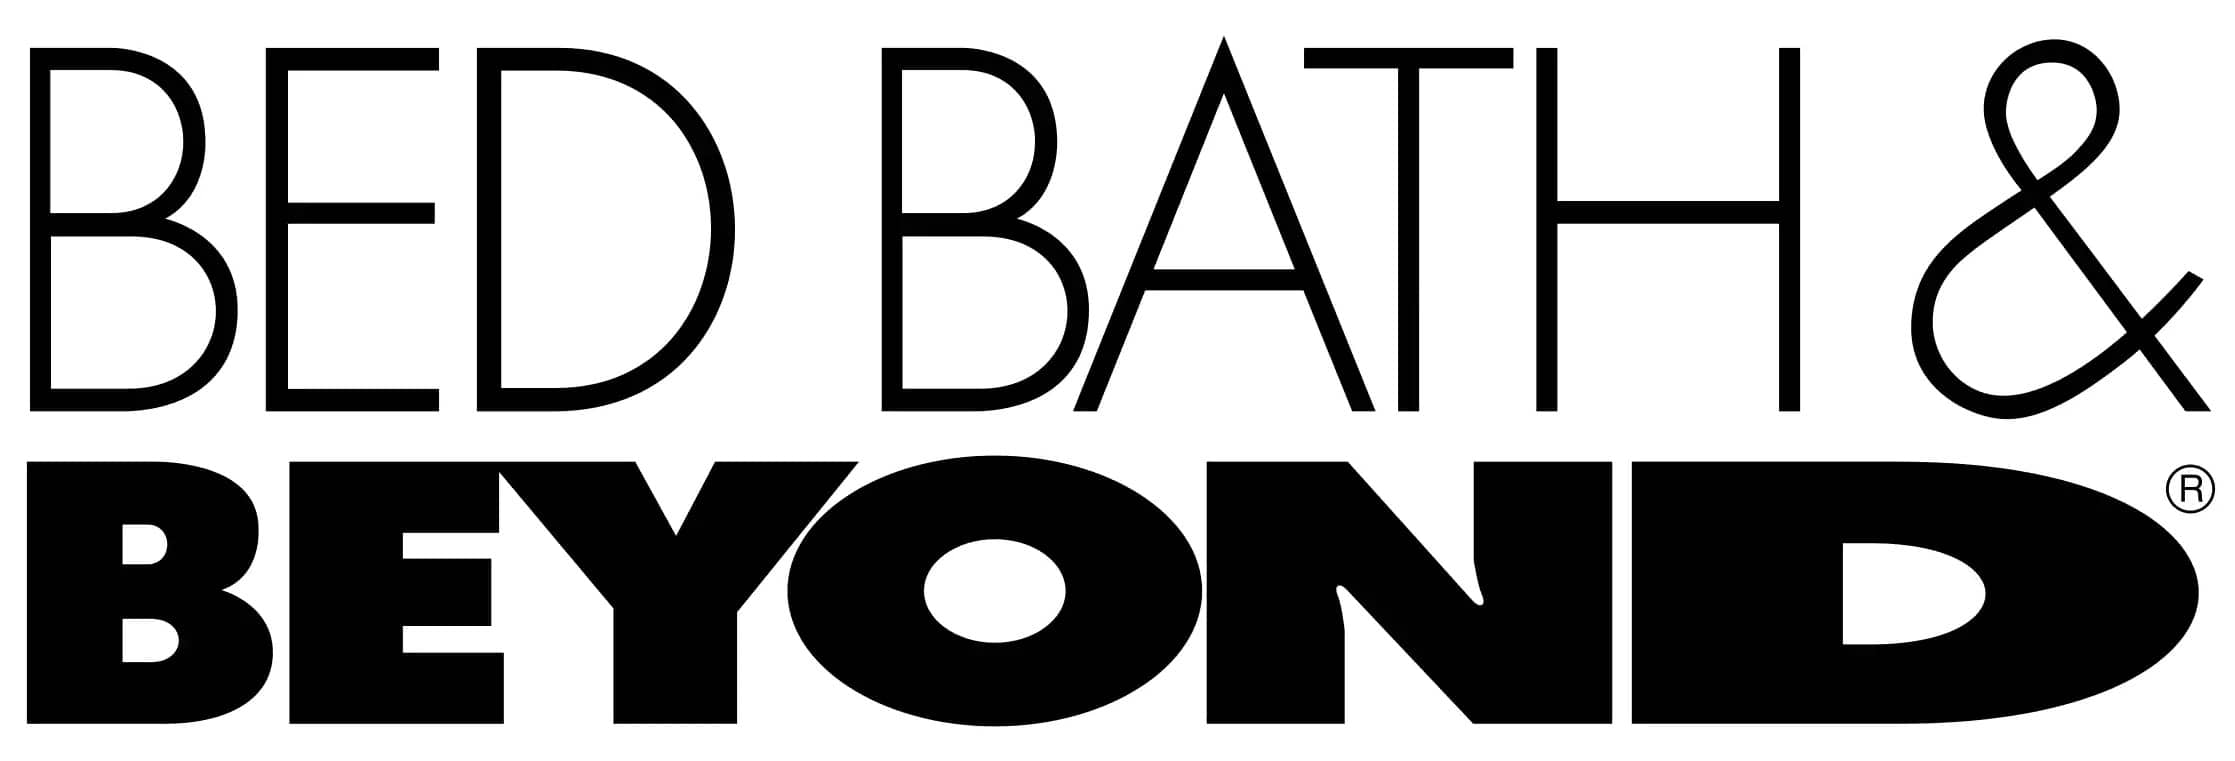 DoorDash: Get 40% off (up to $40) on Bed Bath & Beyond